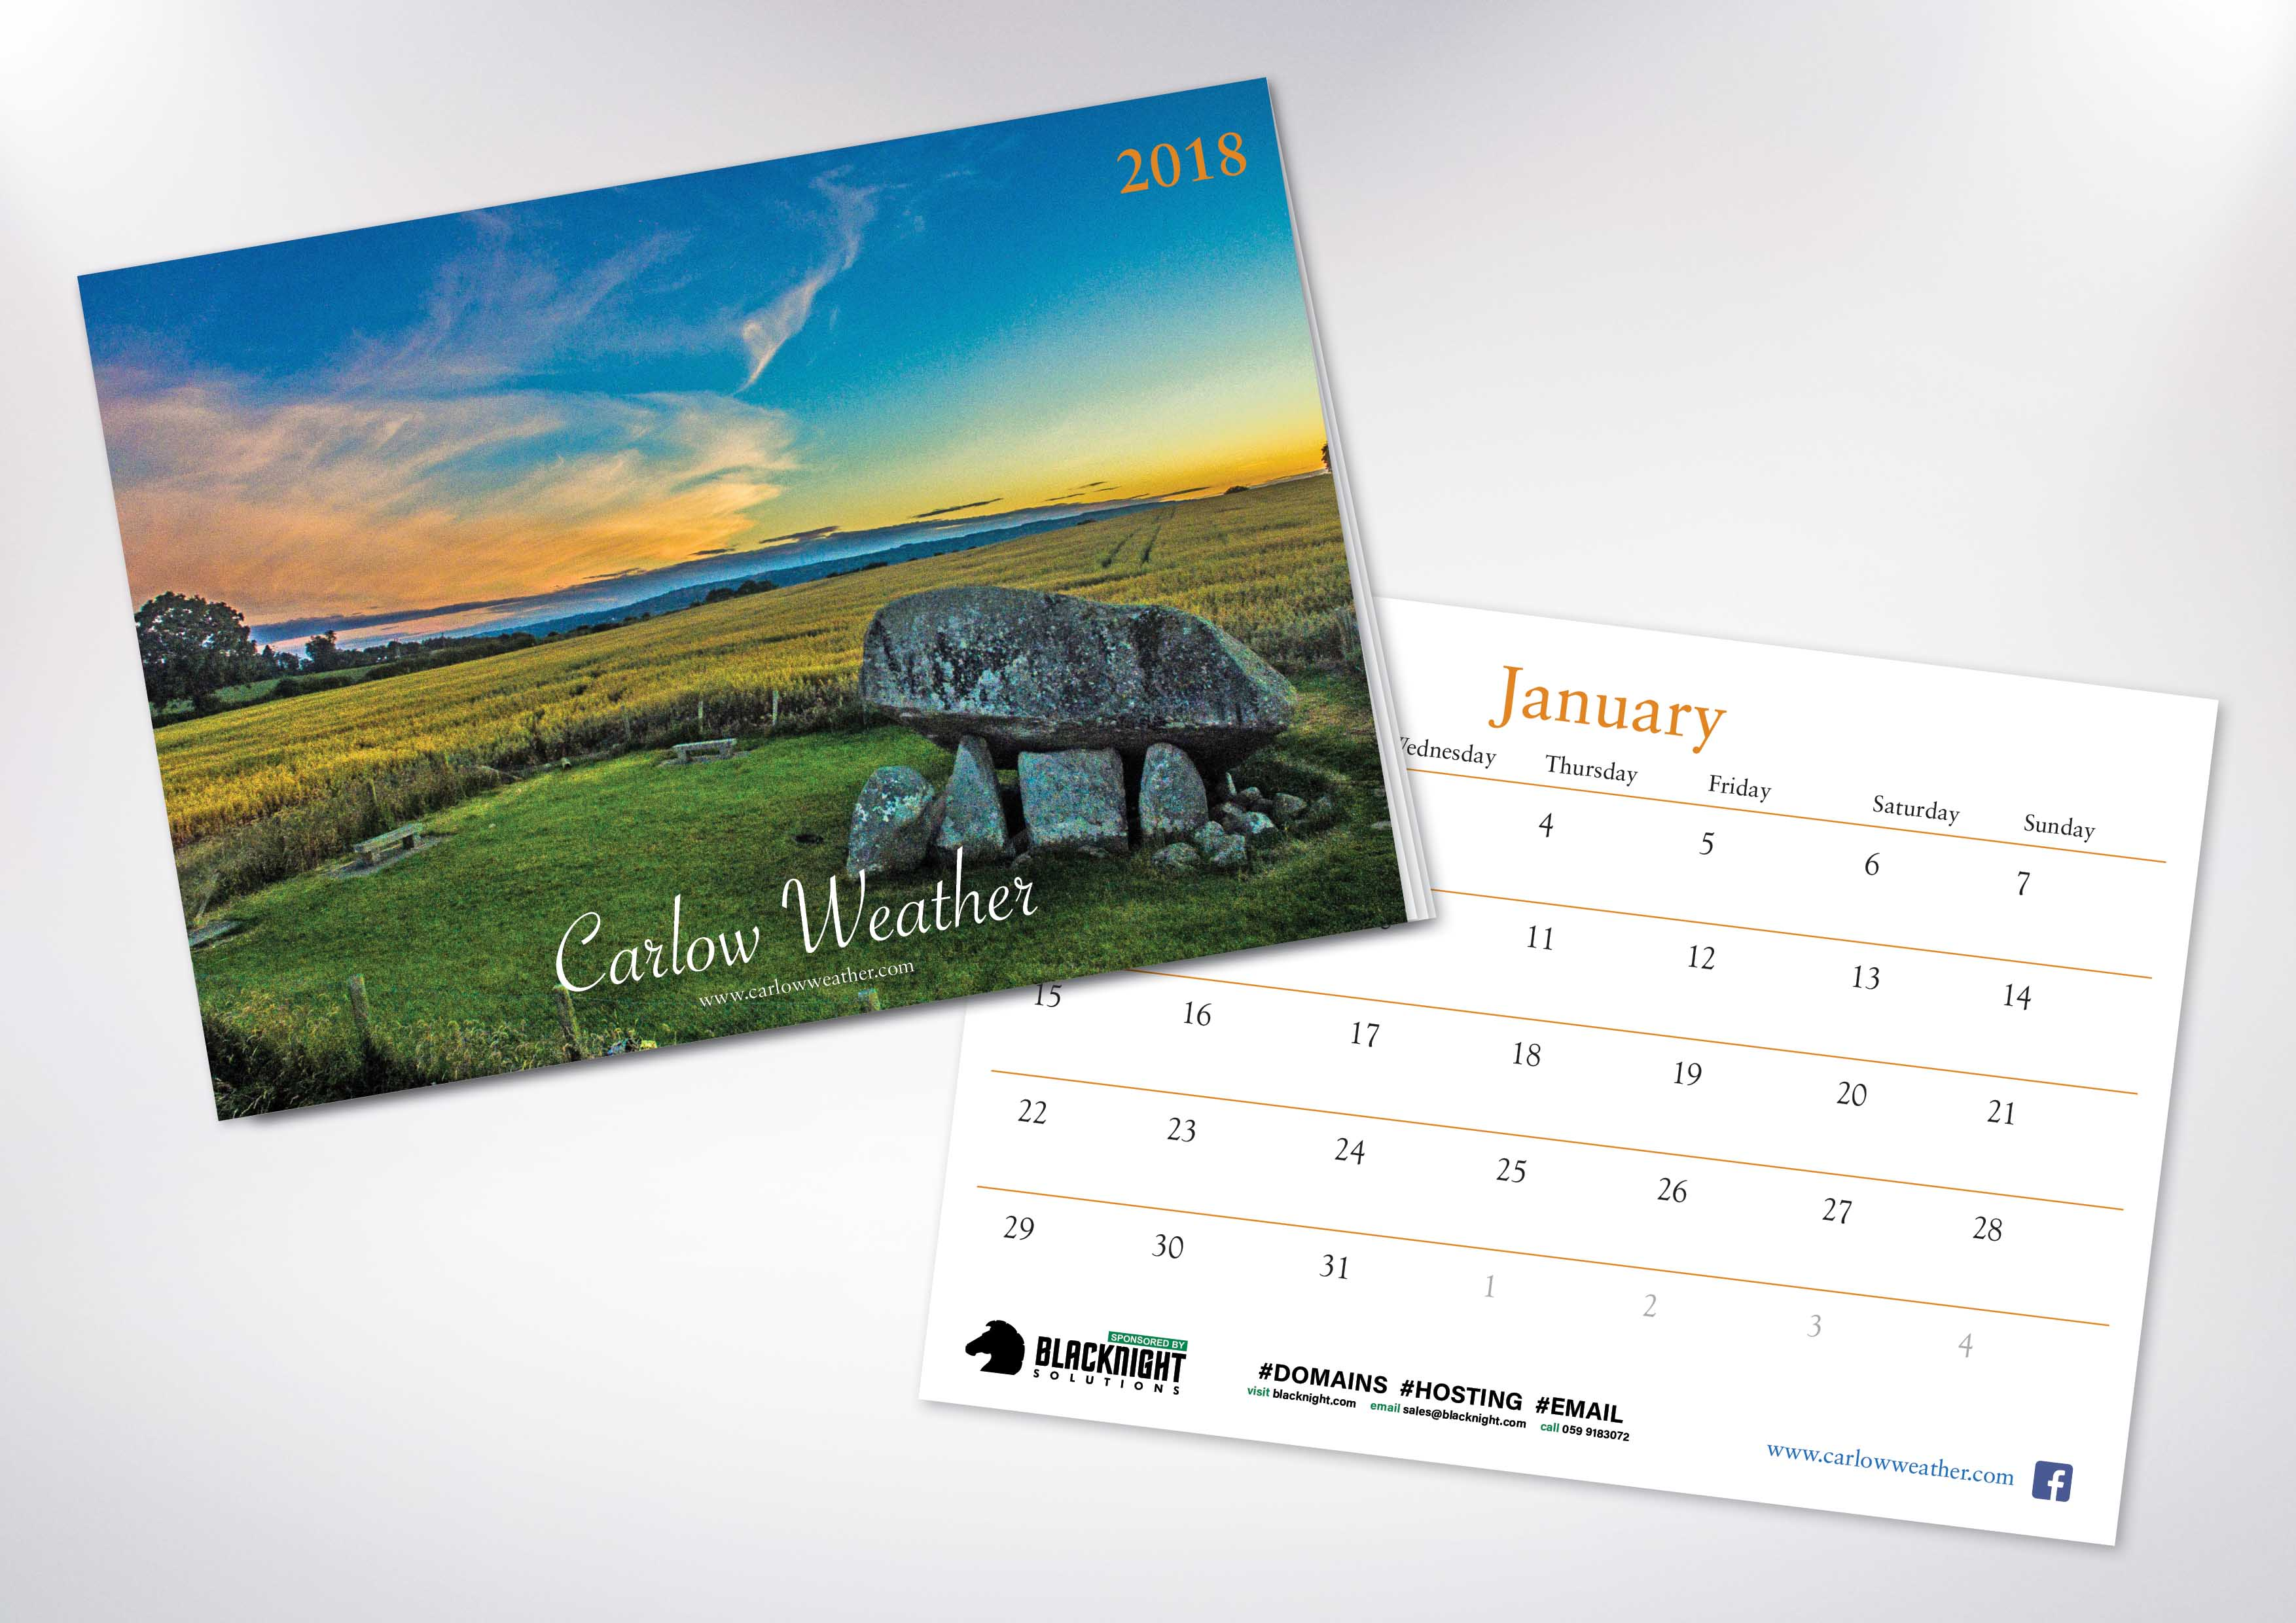 13. Carlow Weather Calendar